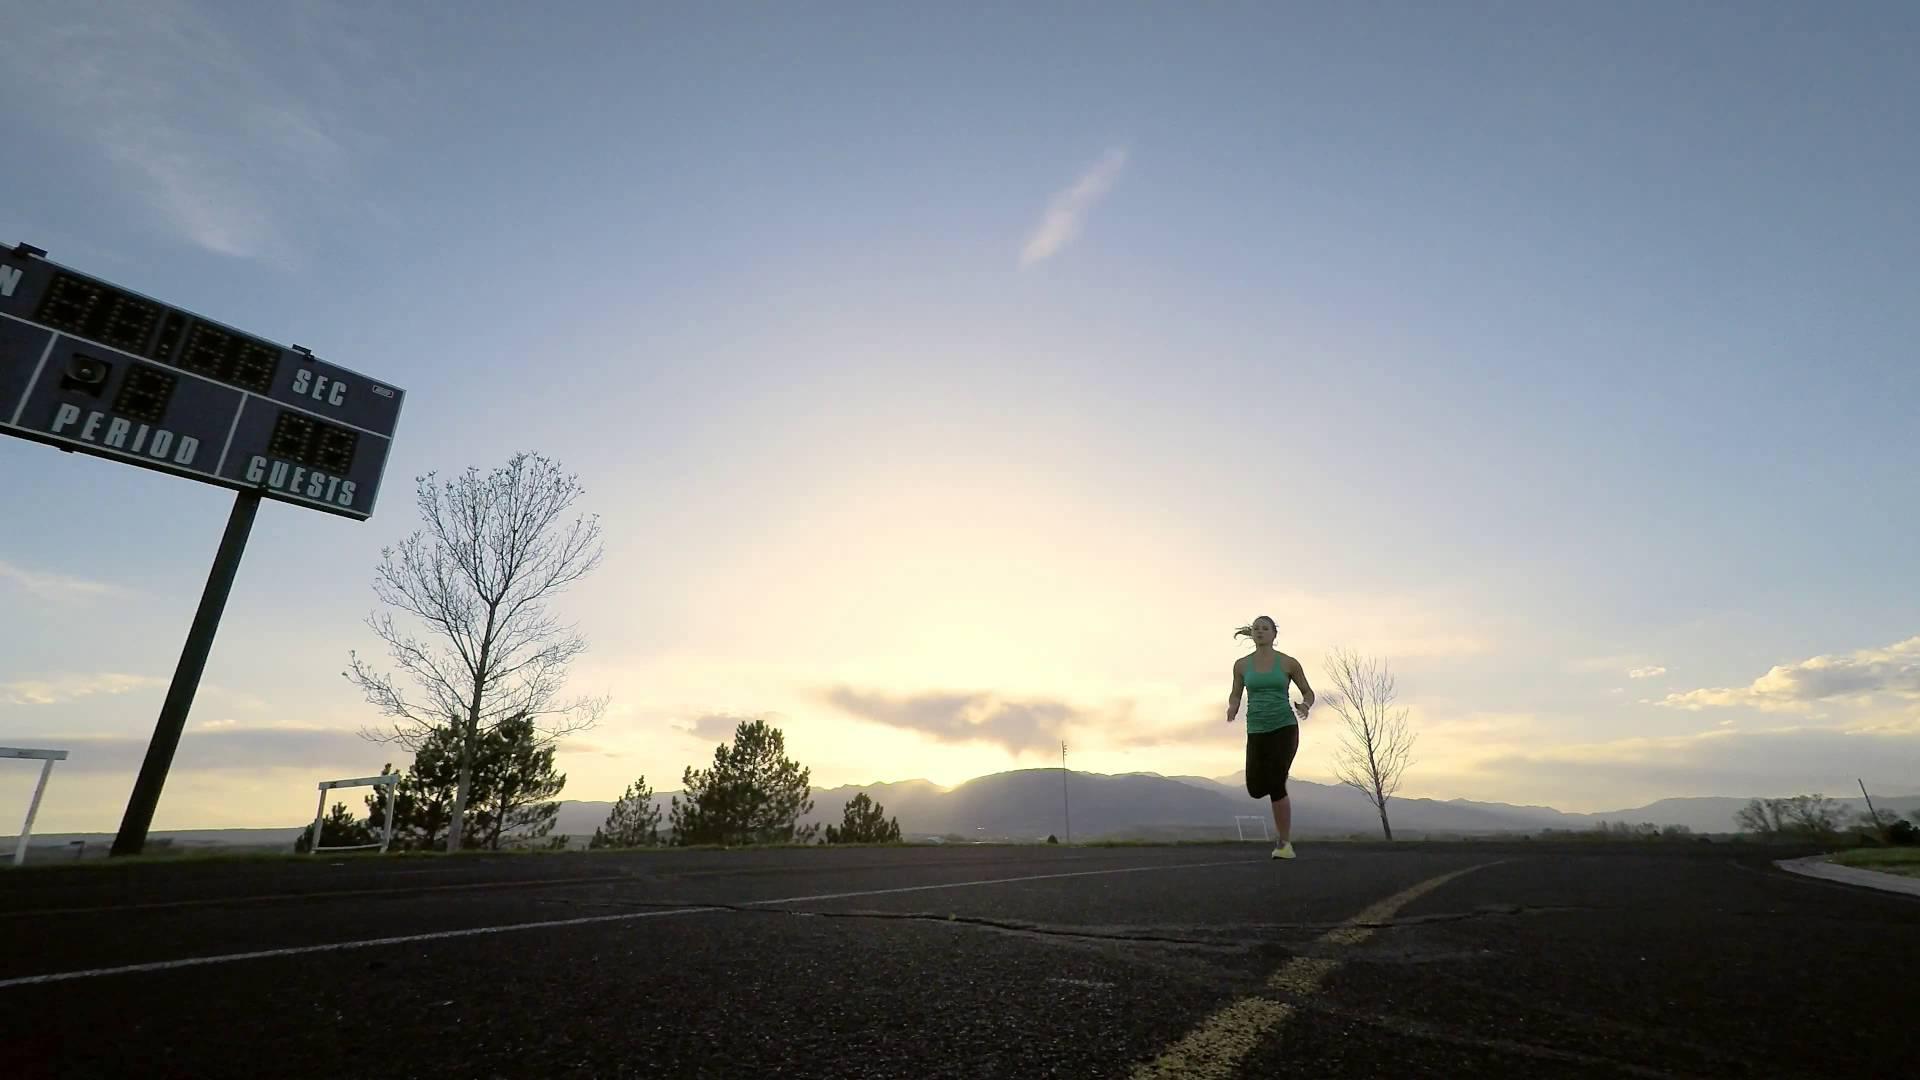 Tuto : Runtastic, Nike+ Running, Endomondo… comment changer d'app sans perdre ses données ?